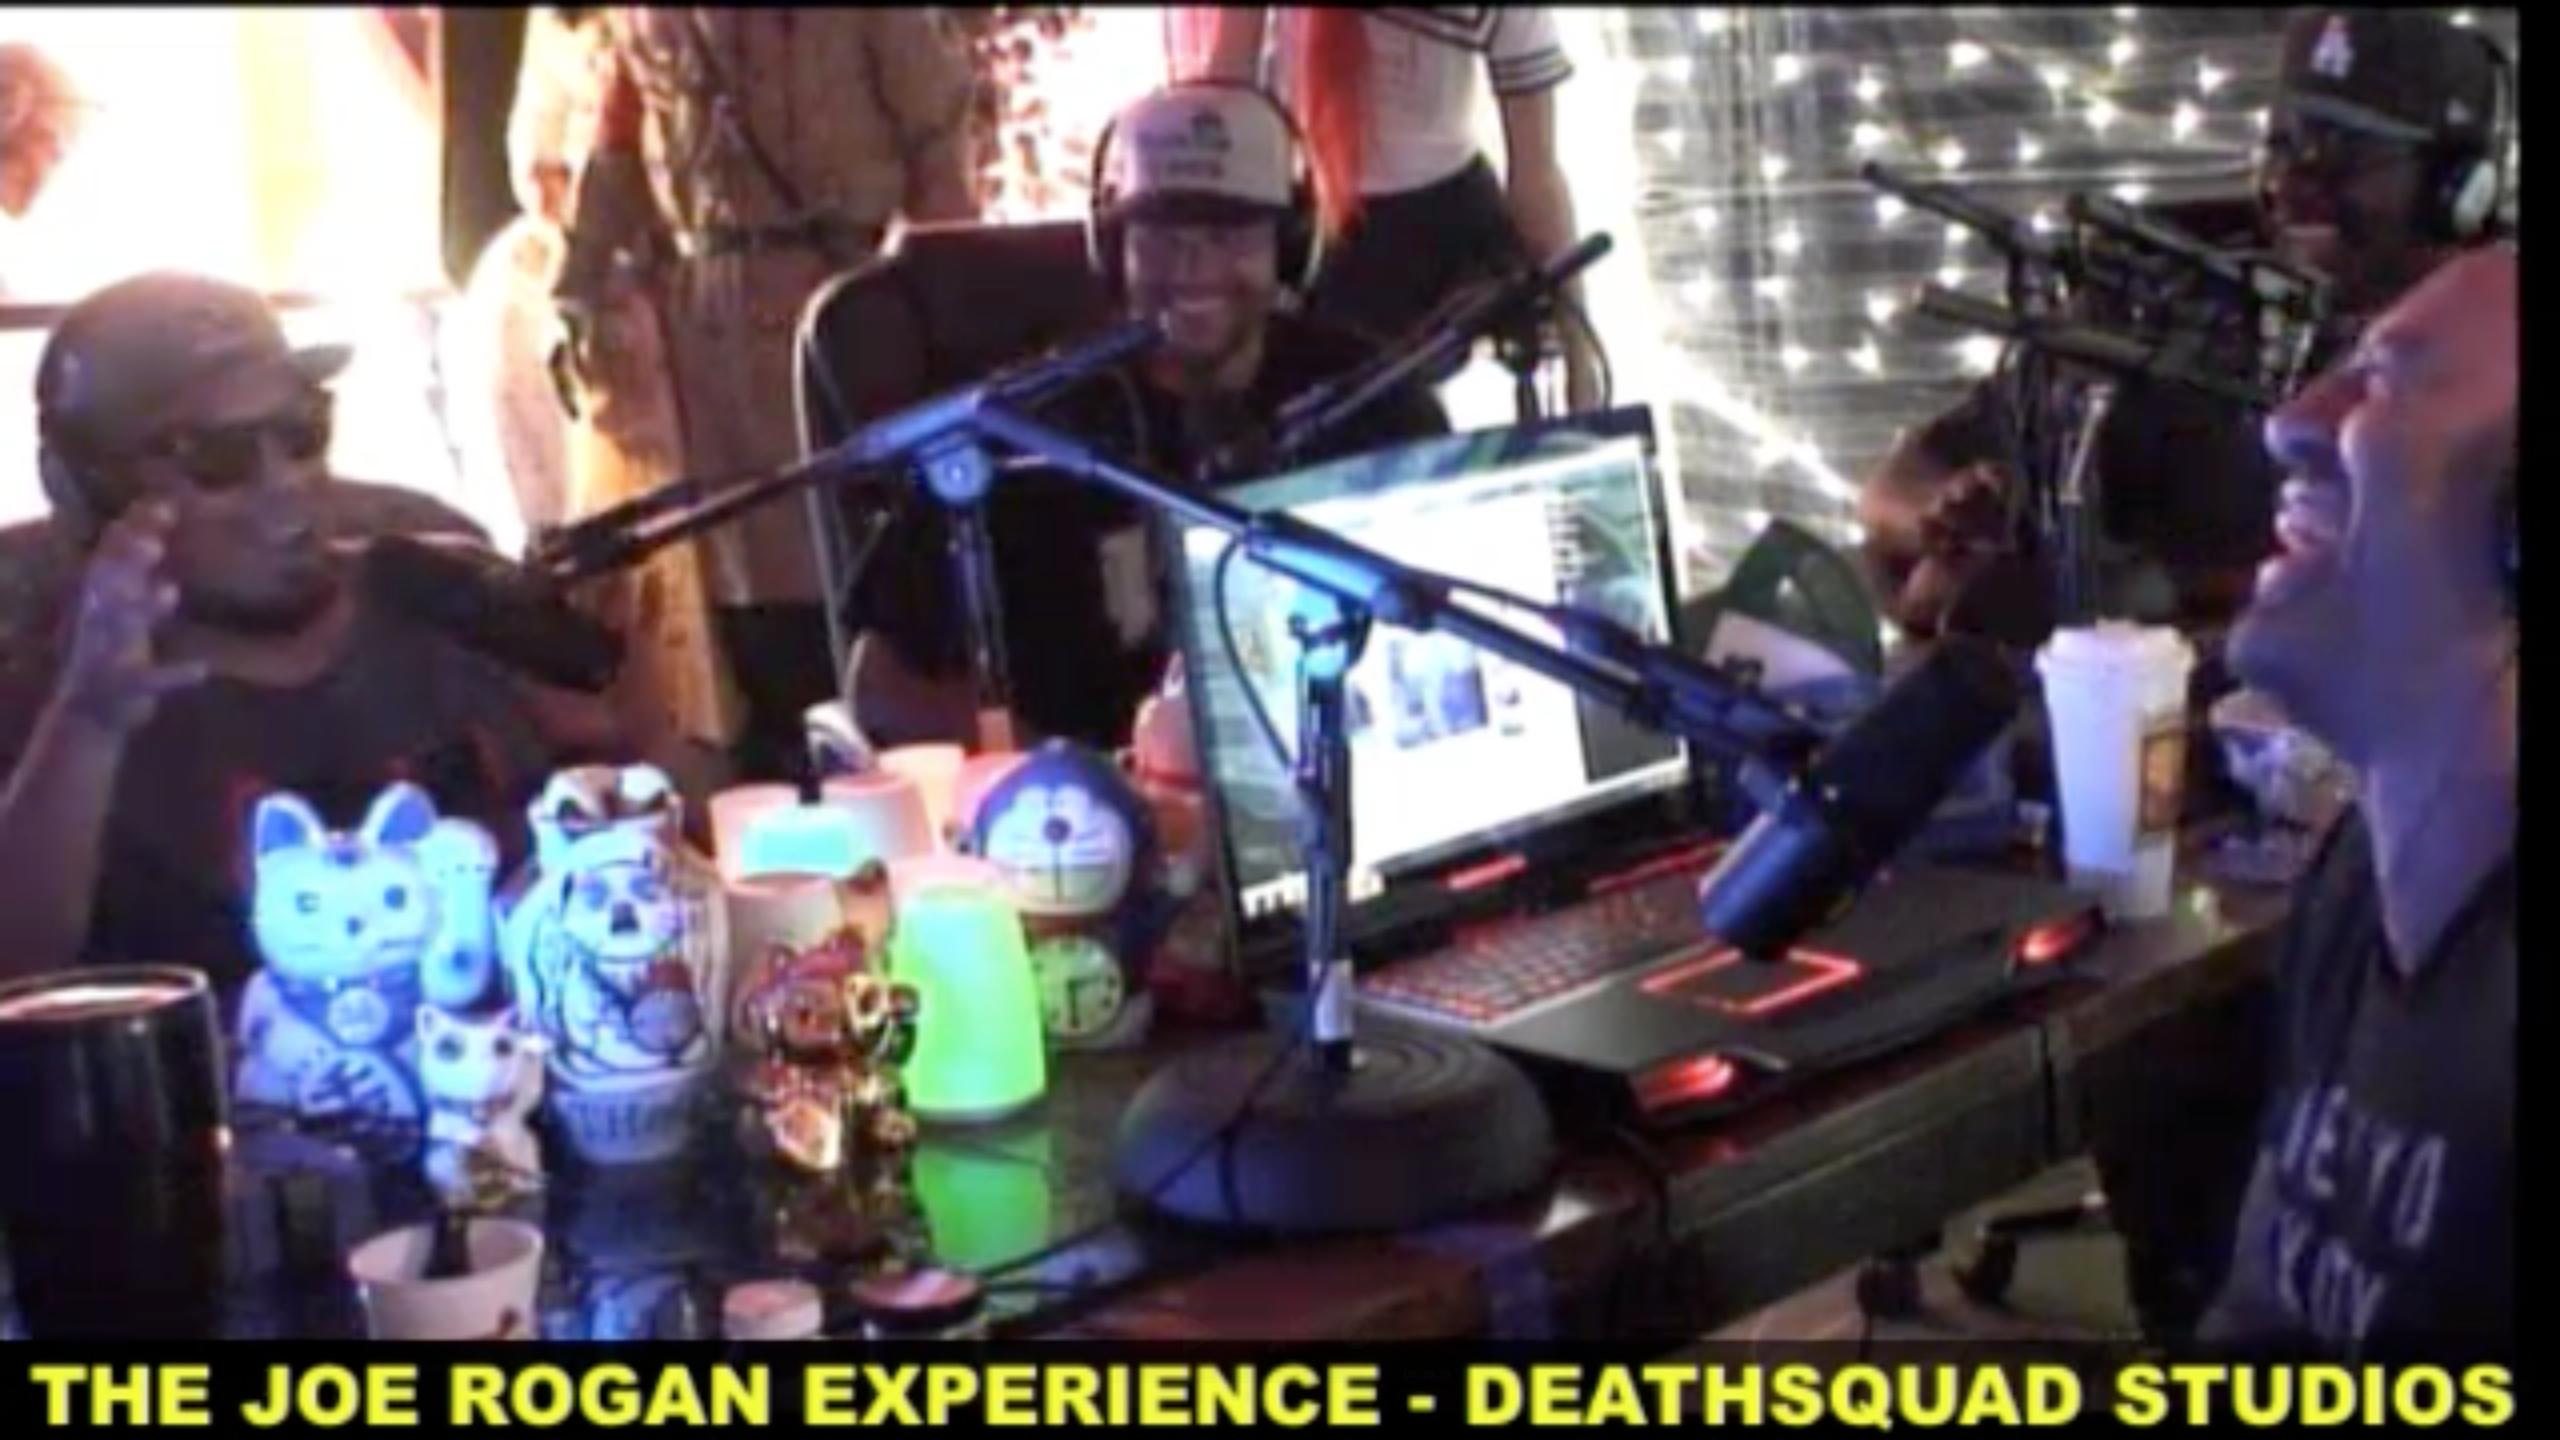 The Joe Rogan Experience #257 - Immortal Technique, Swavey Krokett, DJ GIJOE, Brian Redban